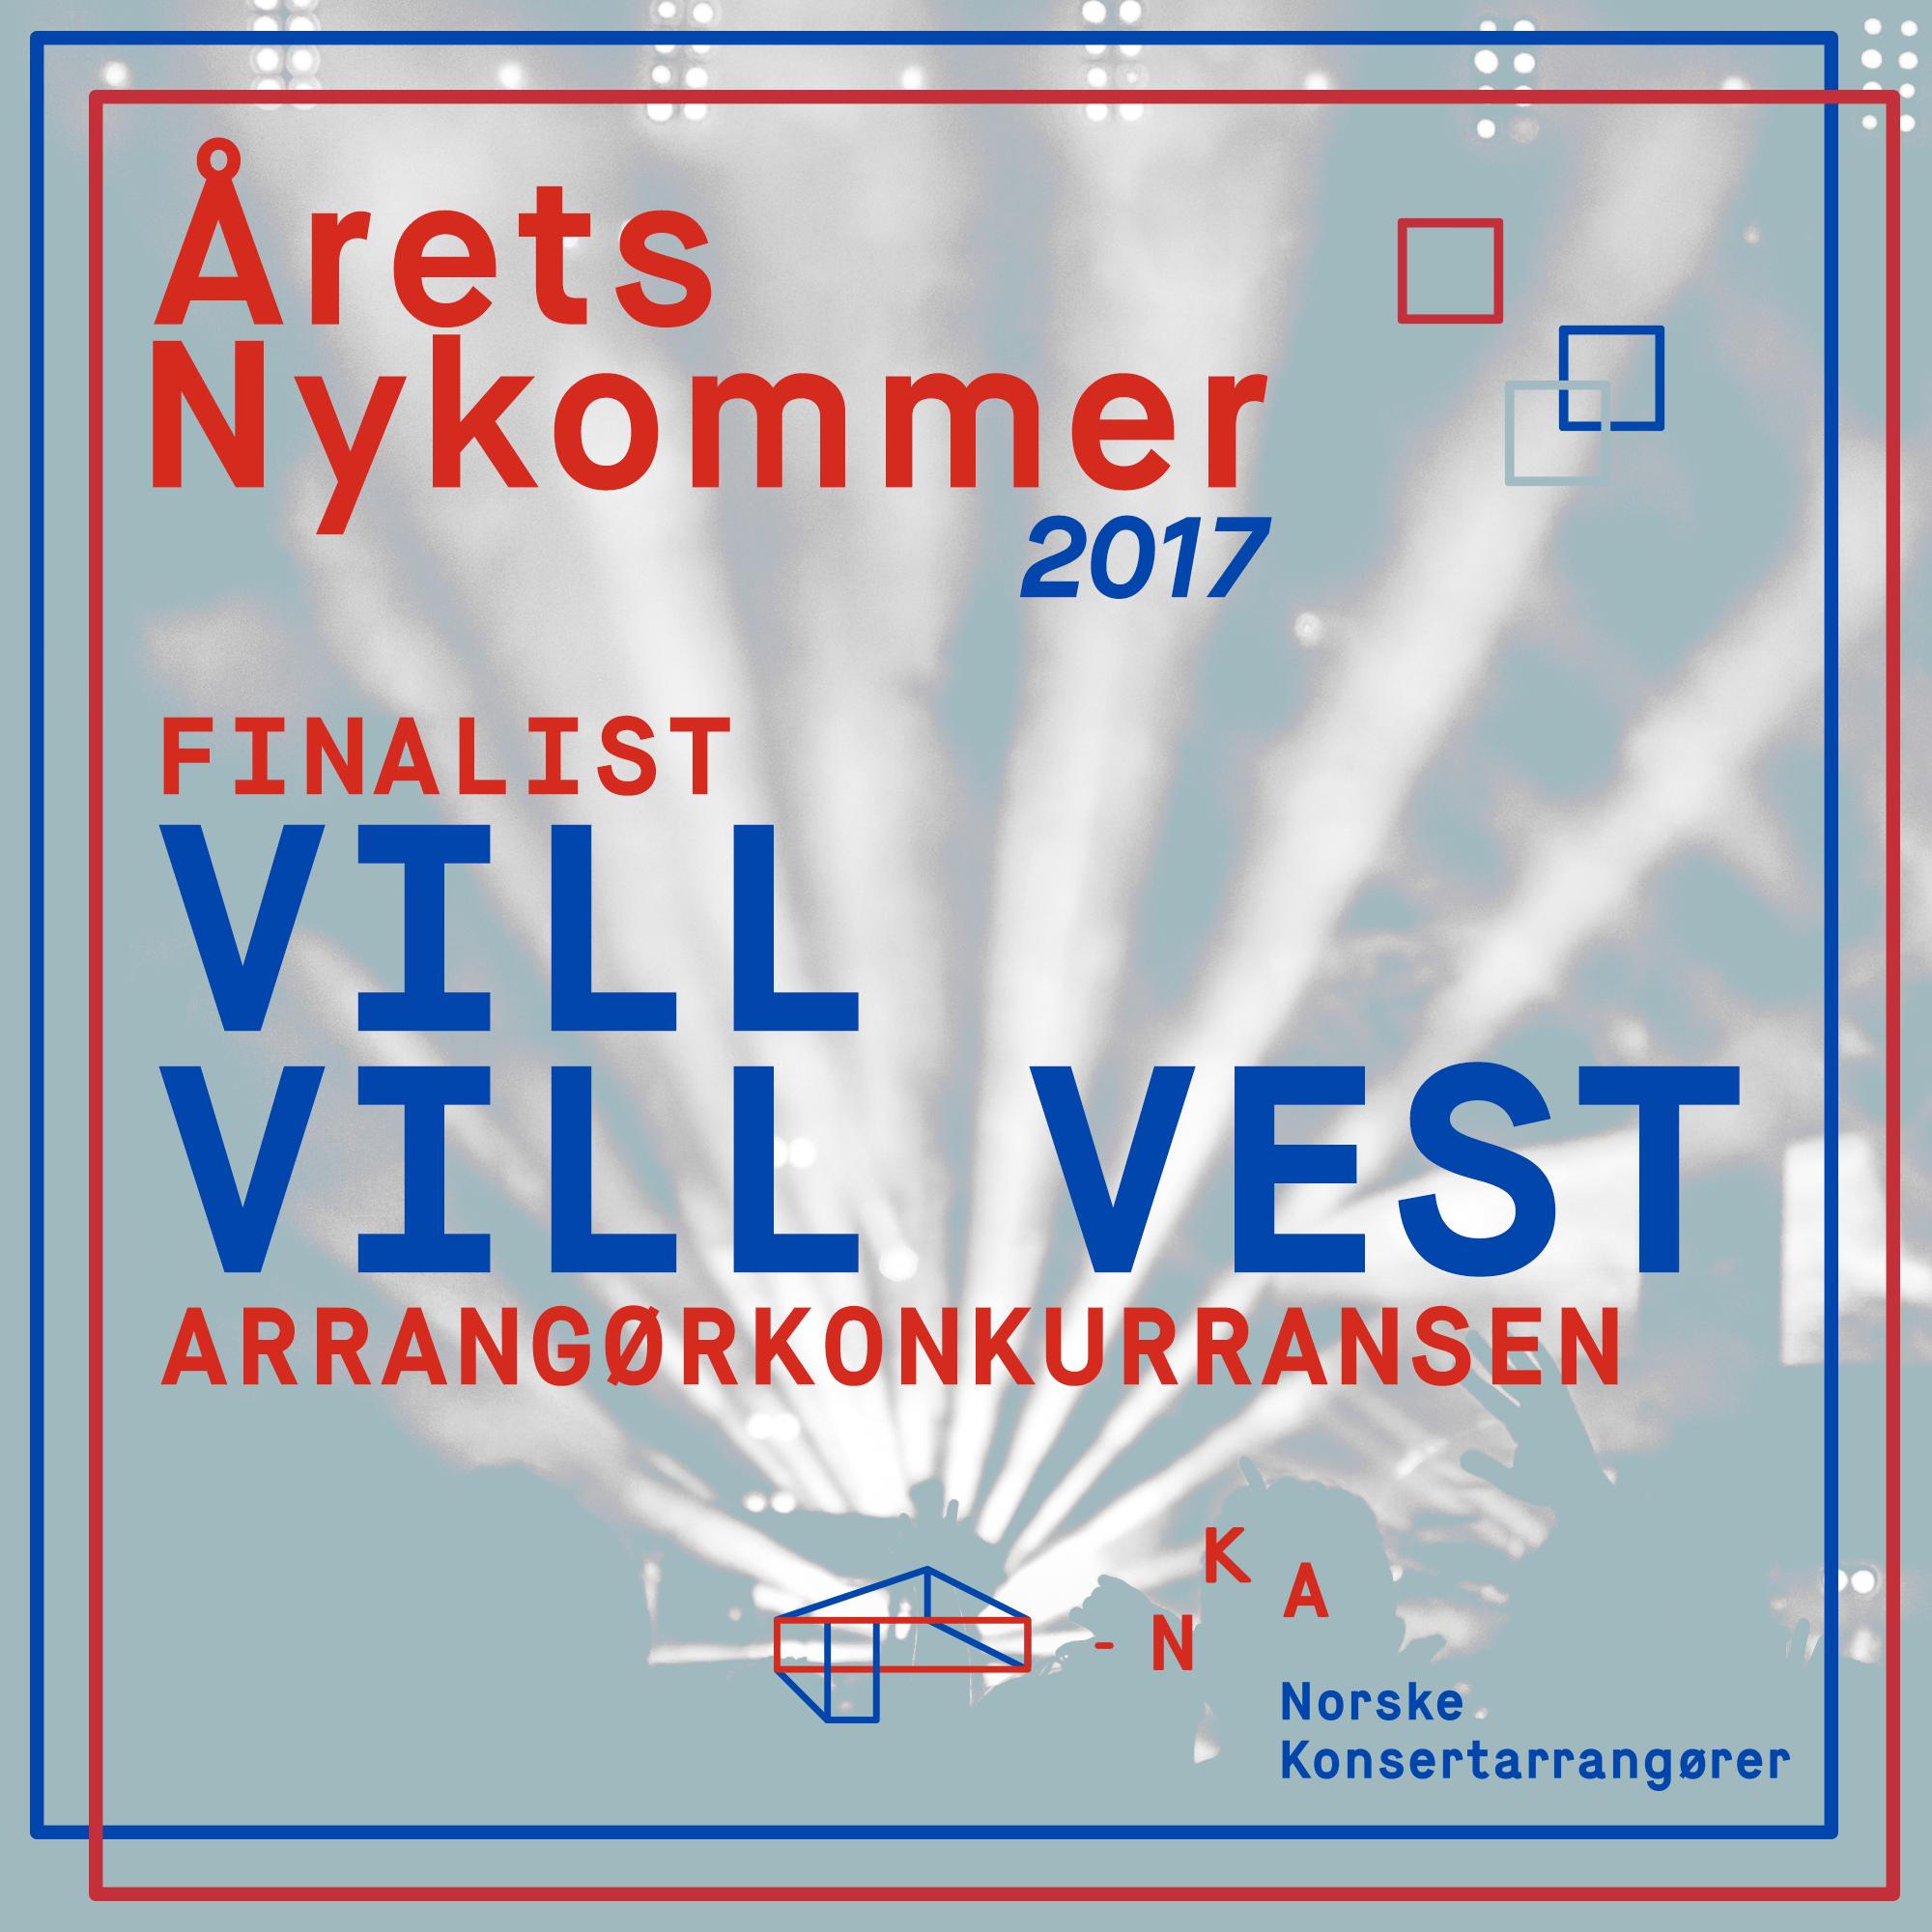 +Ñretsnykommer-villvillvest.png